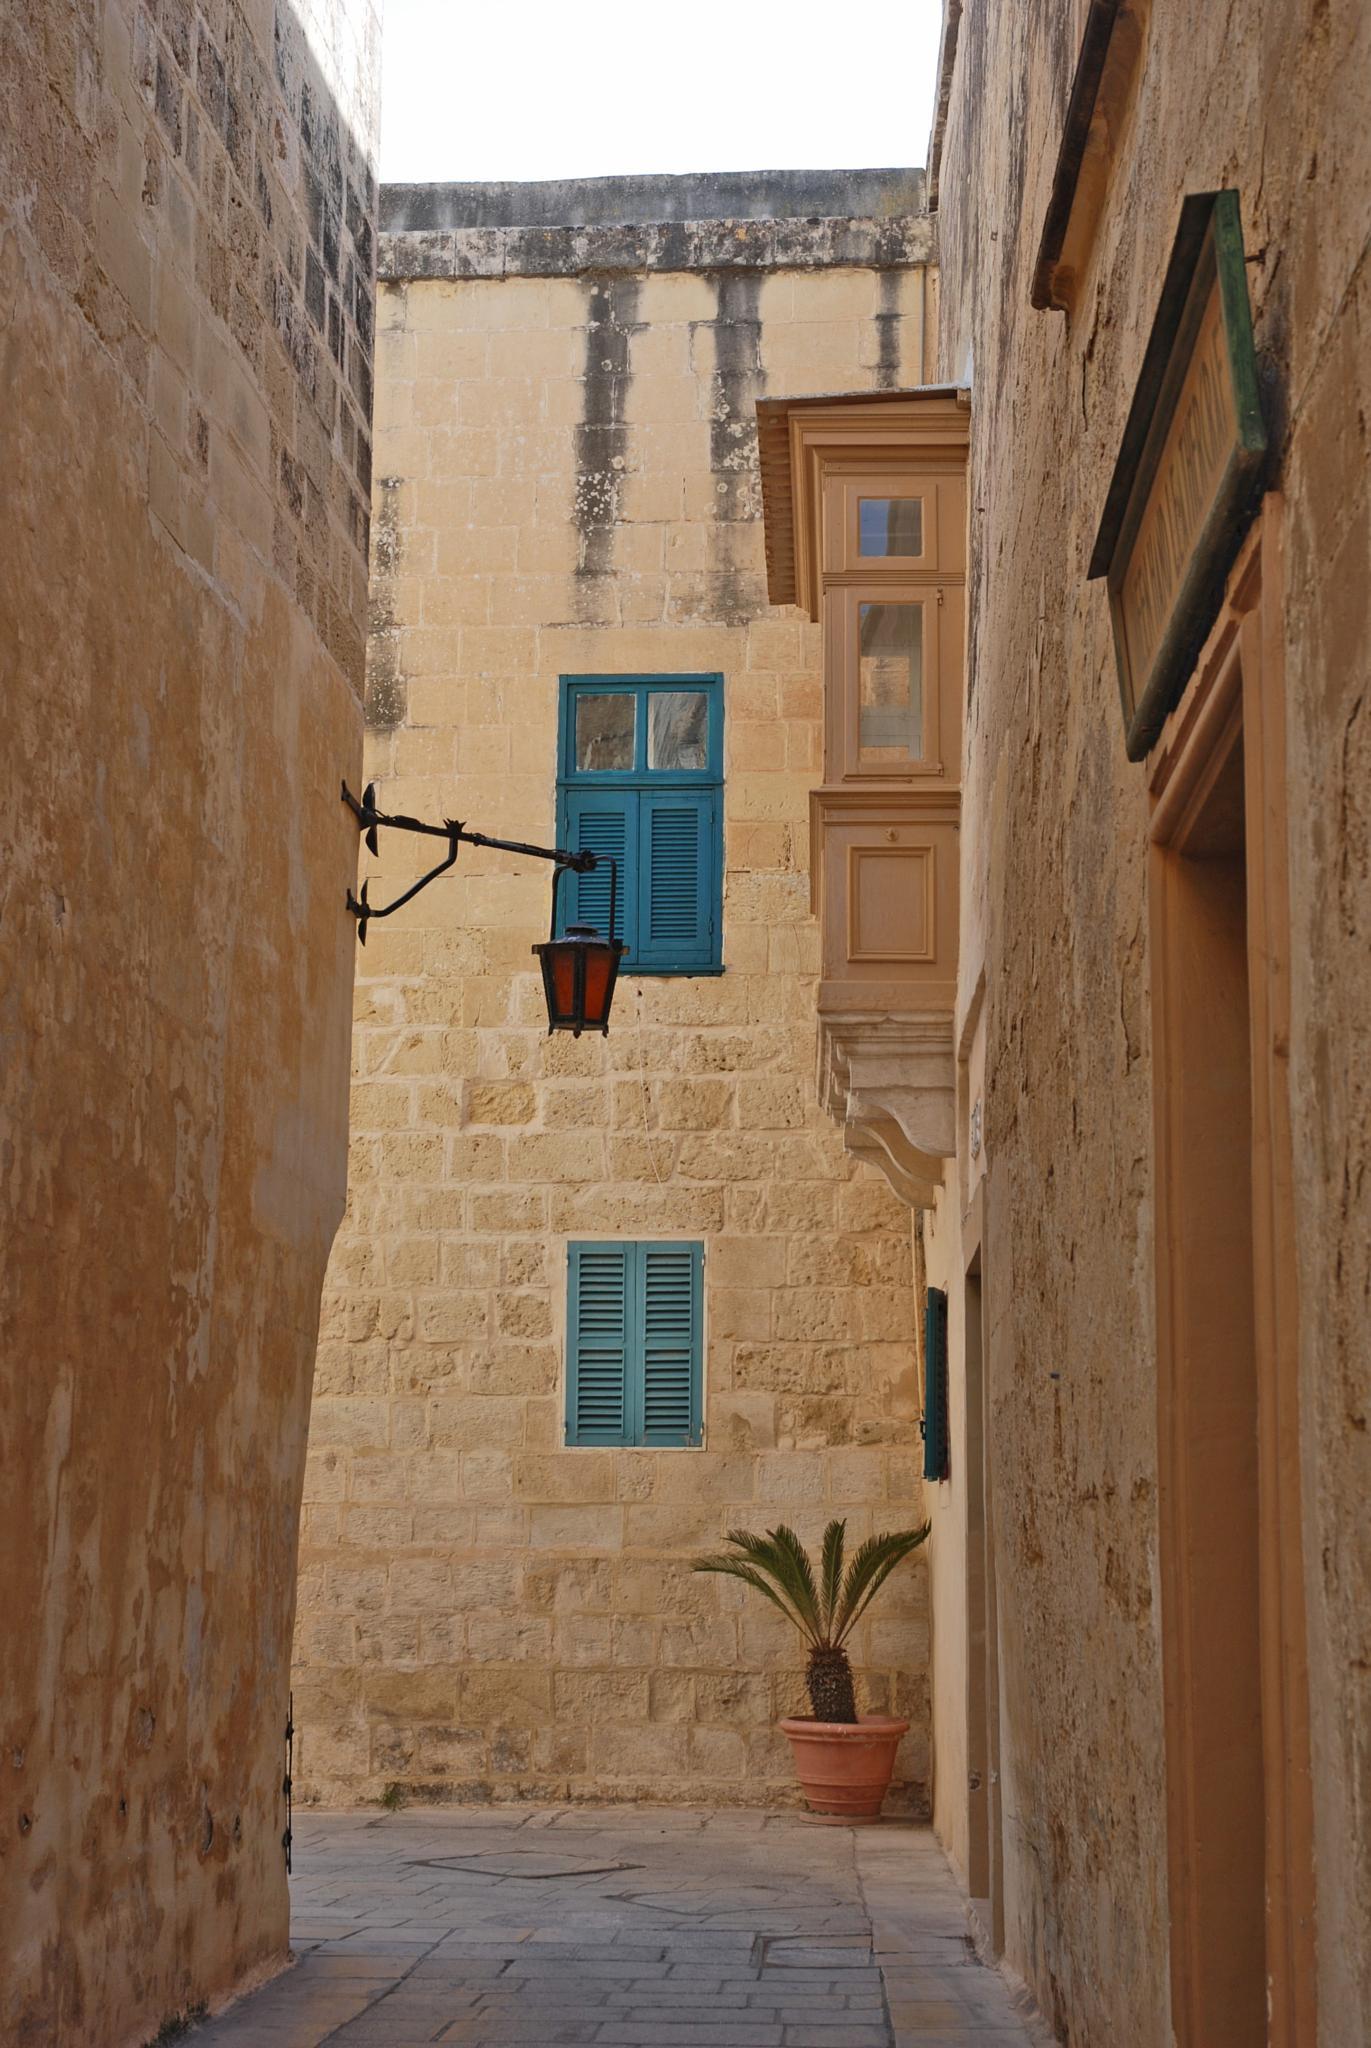 cramped quarters, Mdina, Malta by leena.ekroth